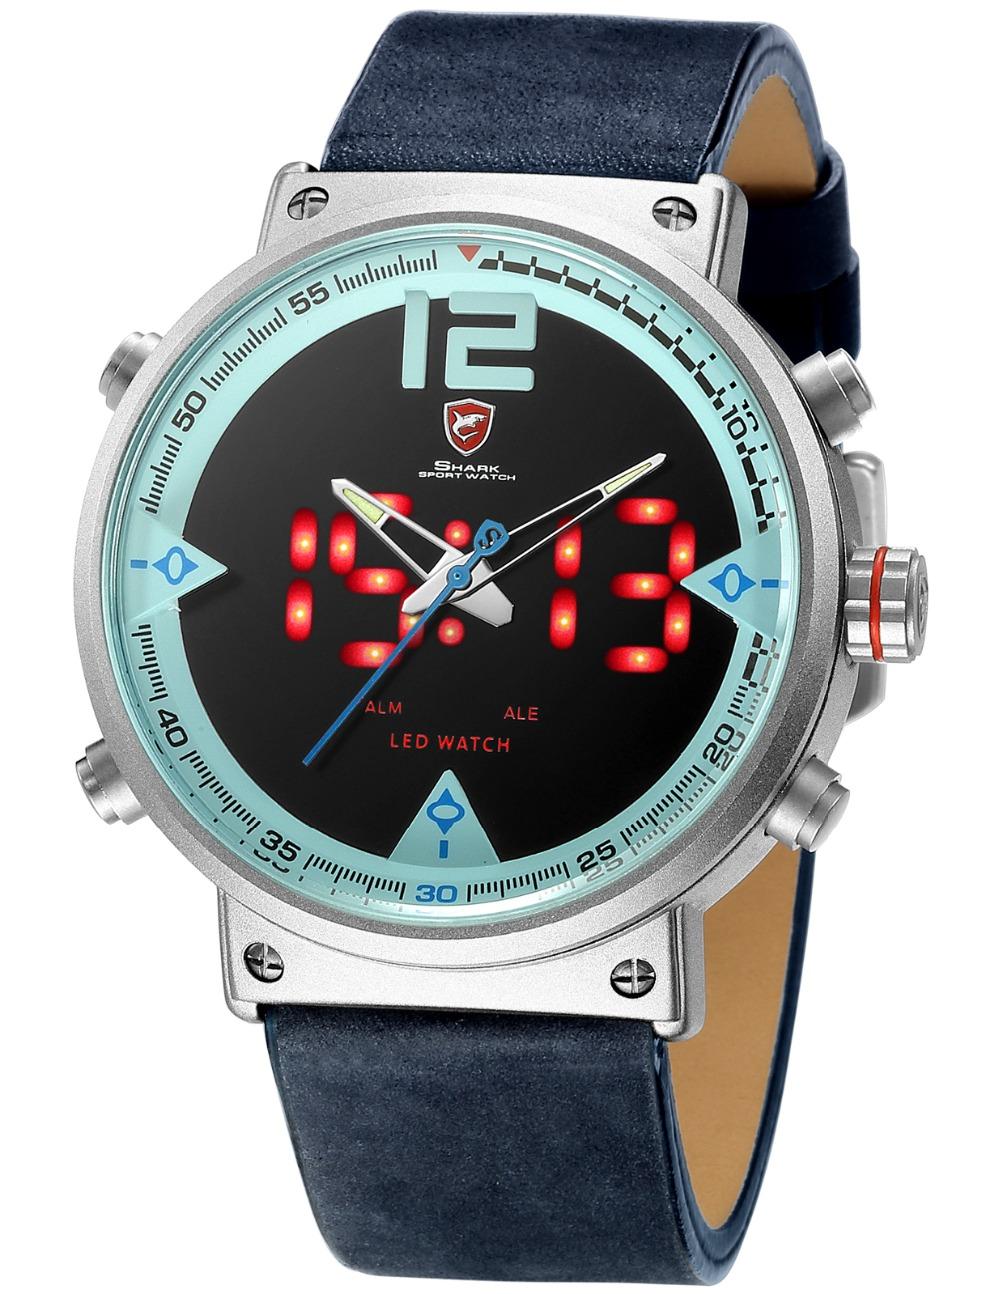 HTB1840DdnnI8KJjSszbq6z4KFXaM - Bluegray Carpet Shark Sport Watch - Blue SH547